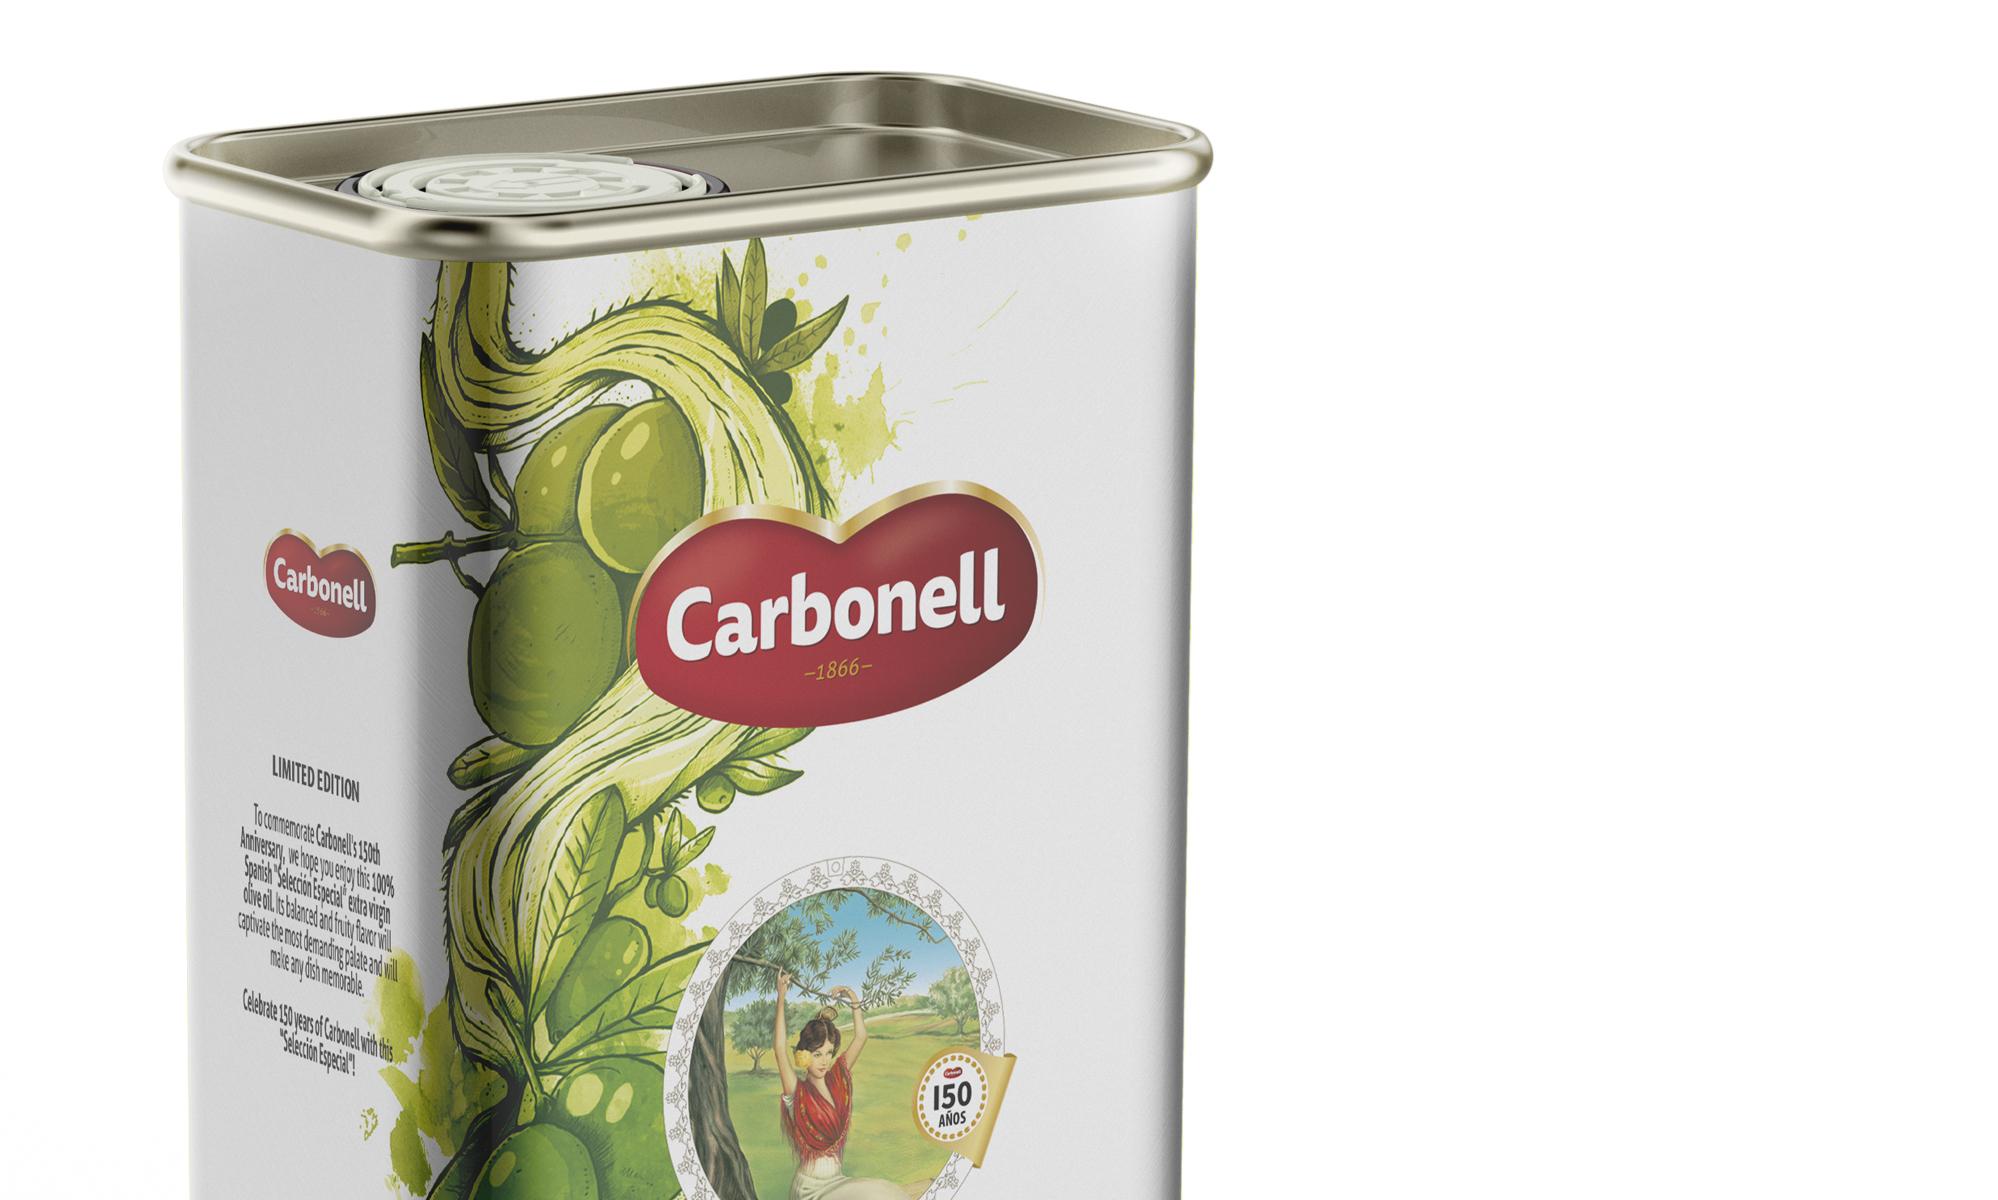 Elephant Estudio - Carbonell Olive Oil2.jpg